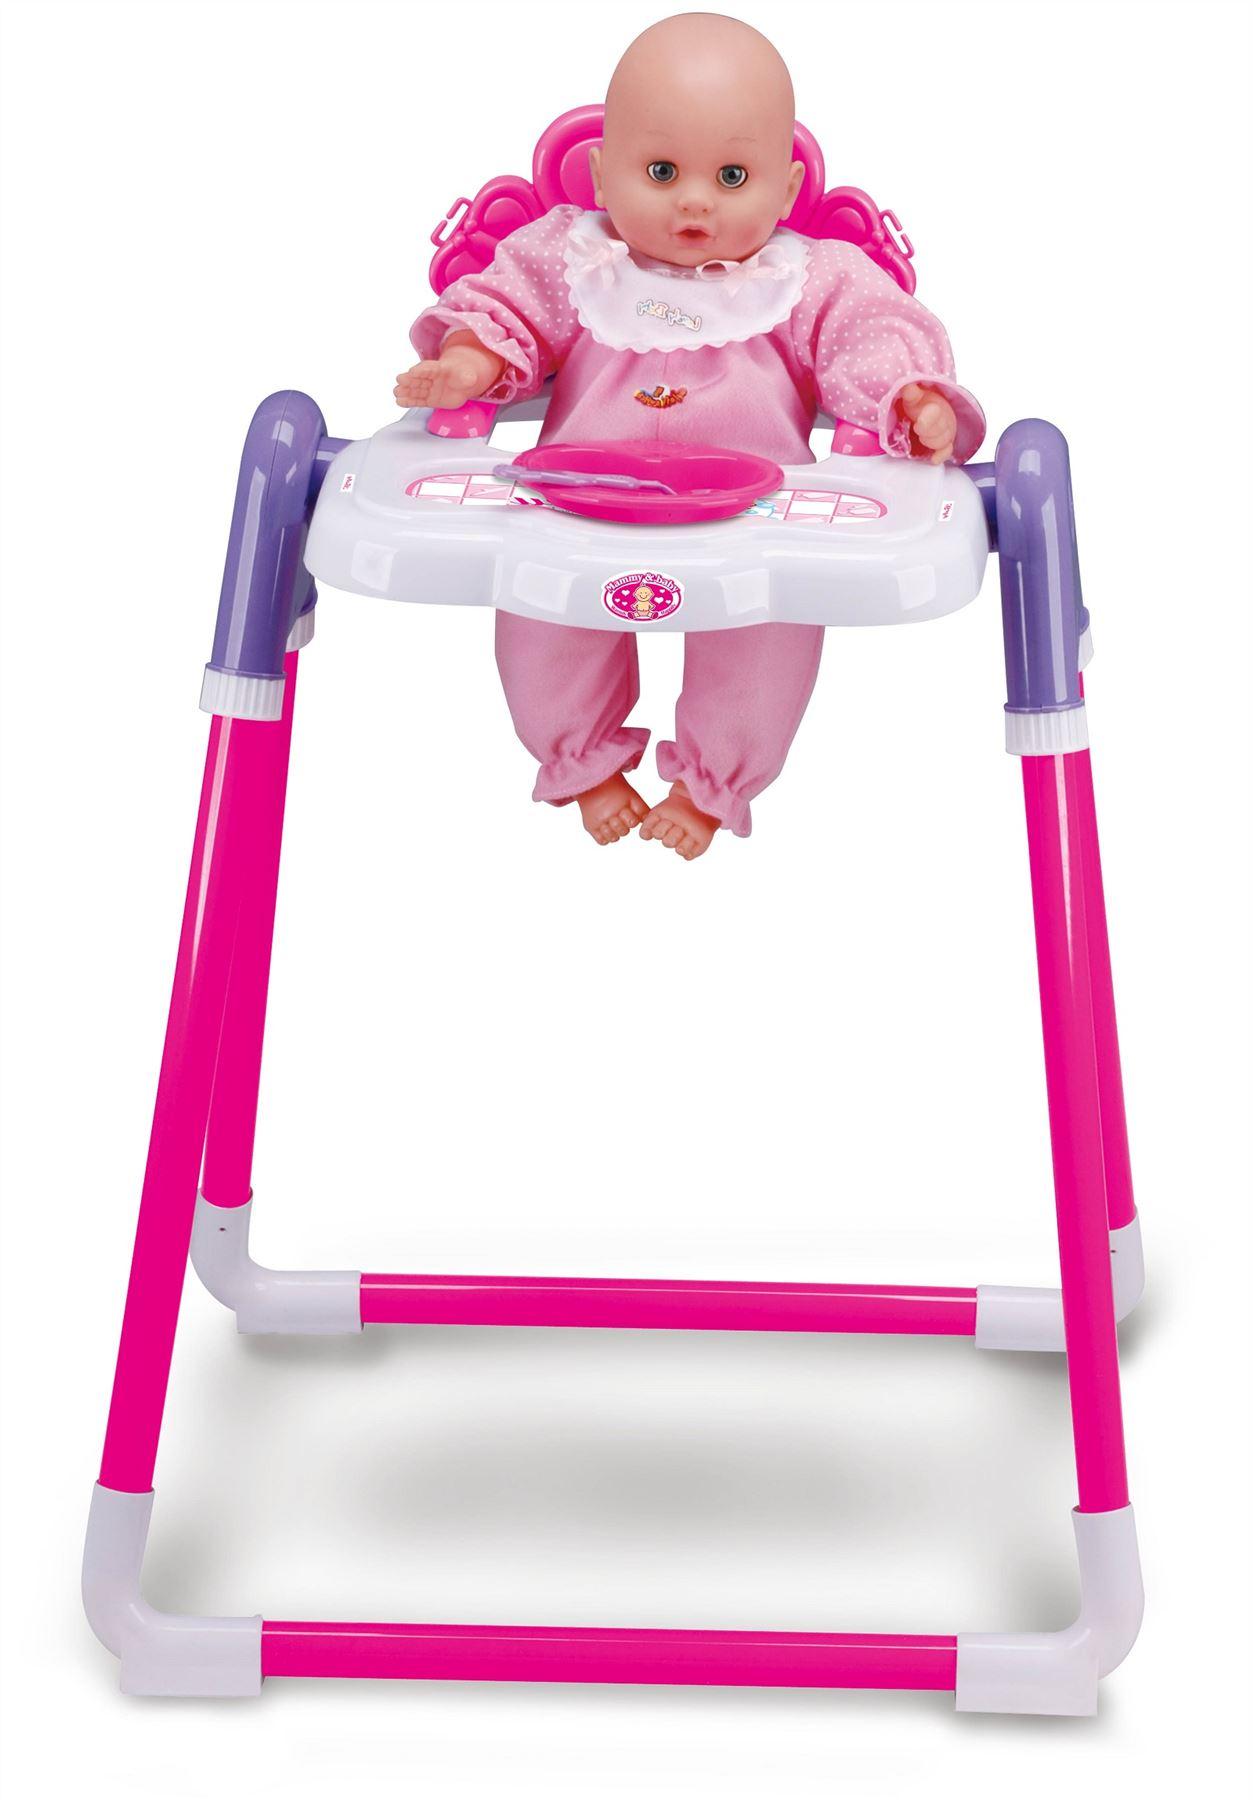 Baby Doll Childrens Kids Pretend Play Feeding High Chair